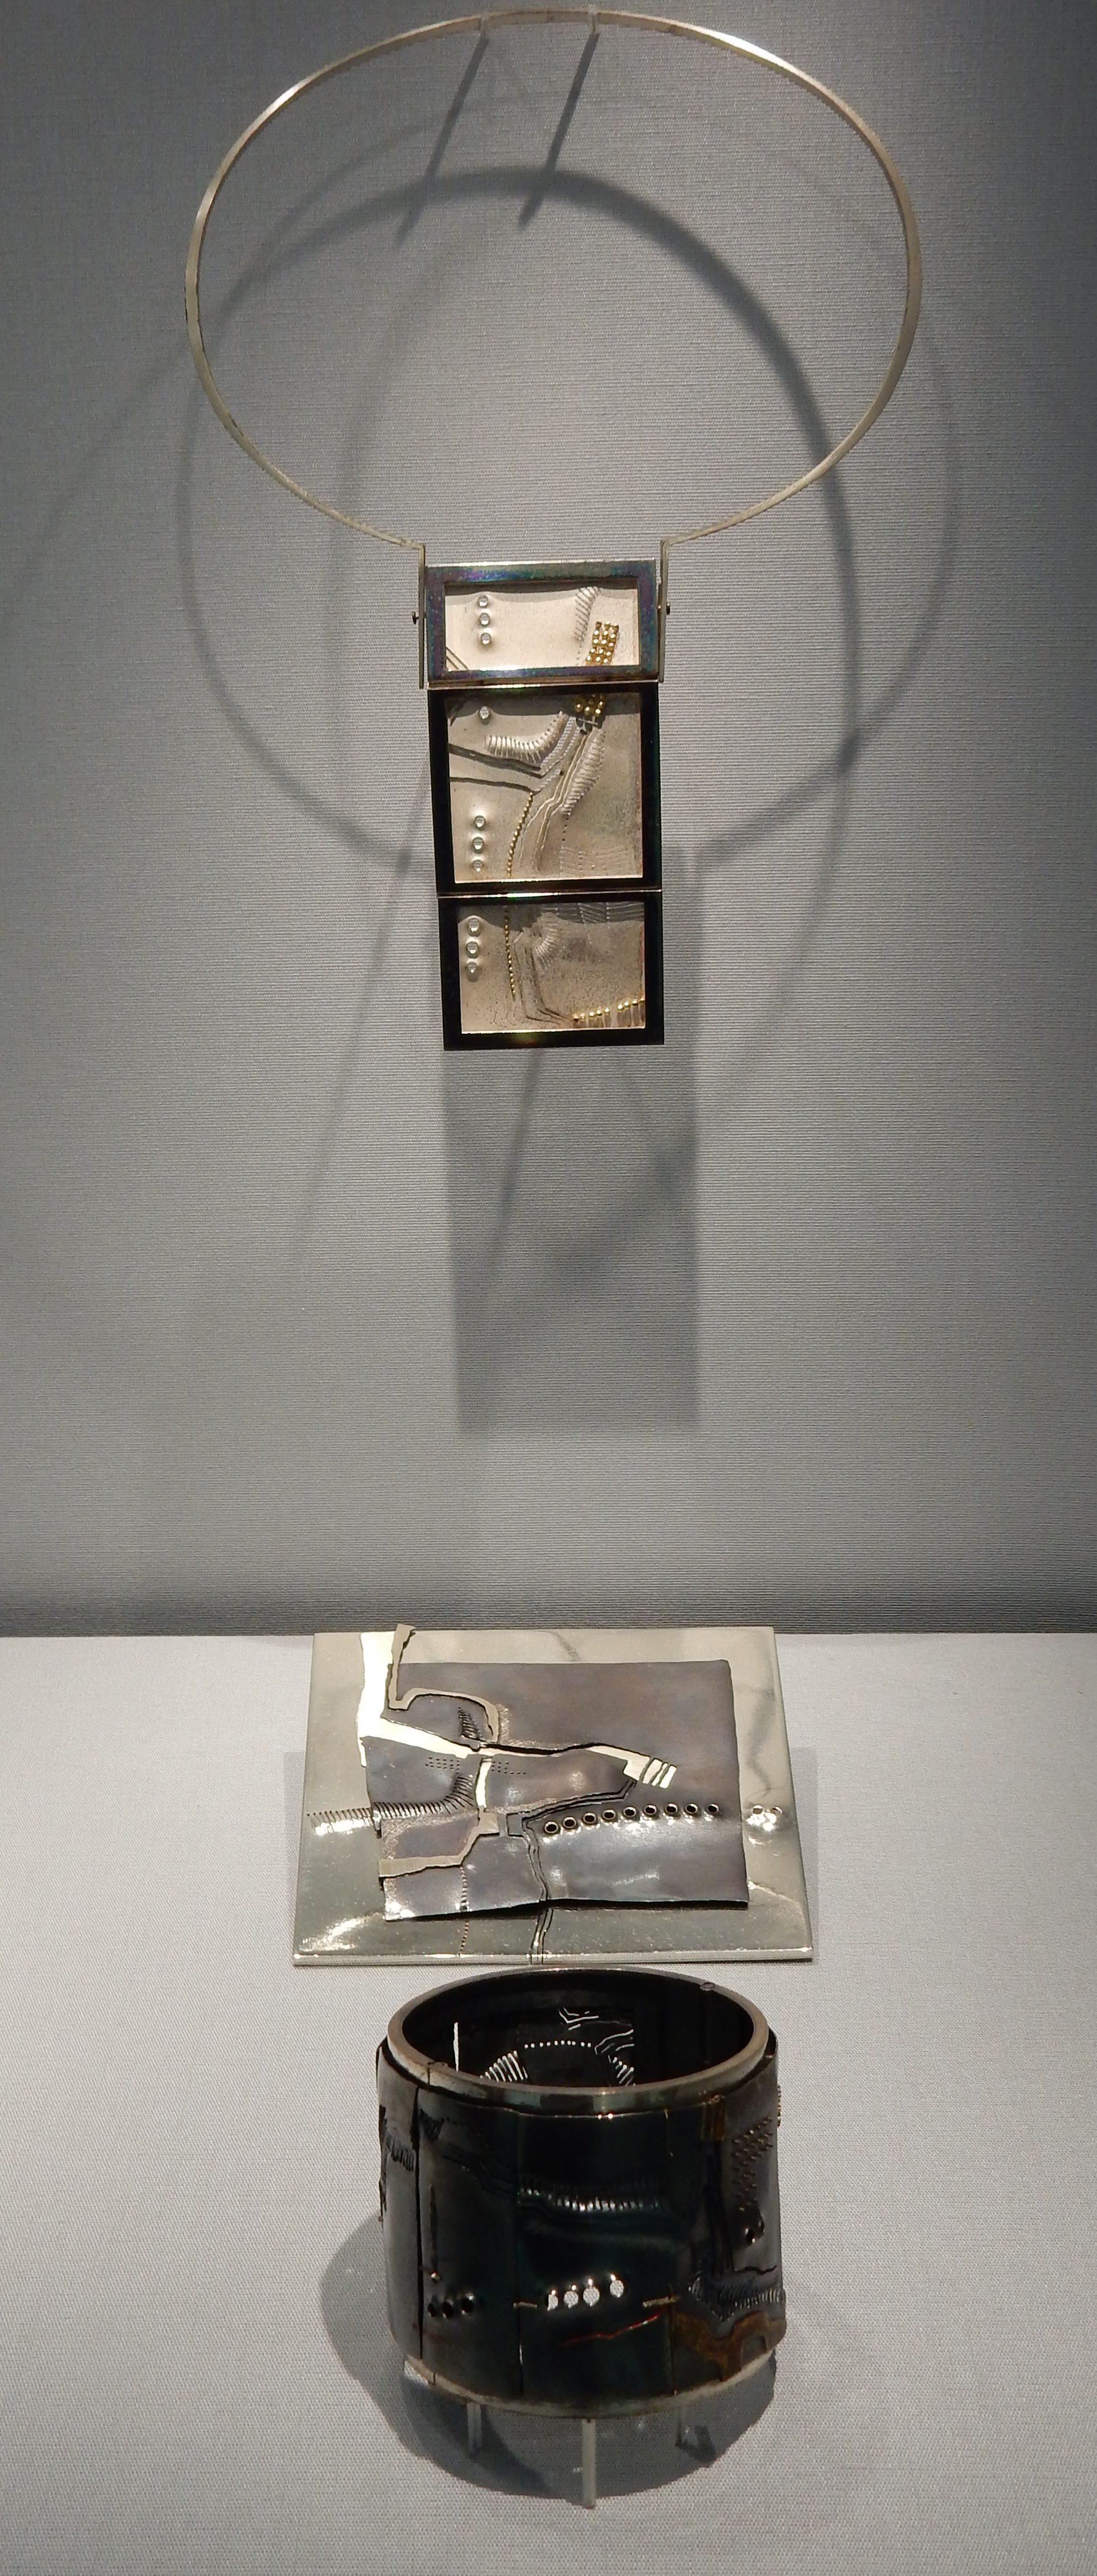 Rüdiger Lorenzen, halssieraad, 1971, miniatuur, 1970, armband, 1969. Schmuckmuseum Pforzheim. Foto met dank aan Coert Peter Krabbe, september 2018, CC BY 4.0